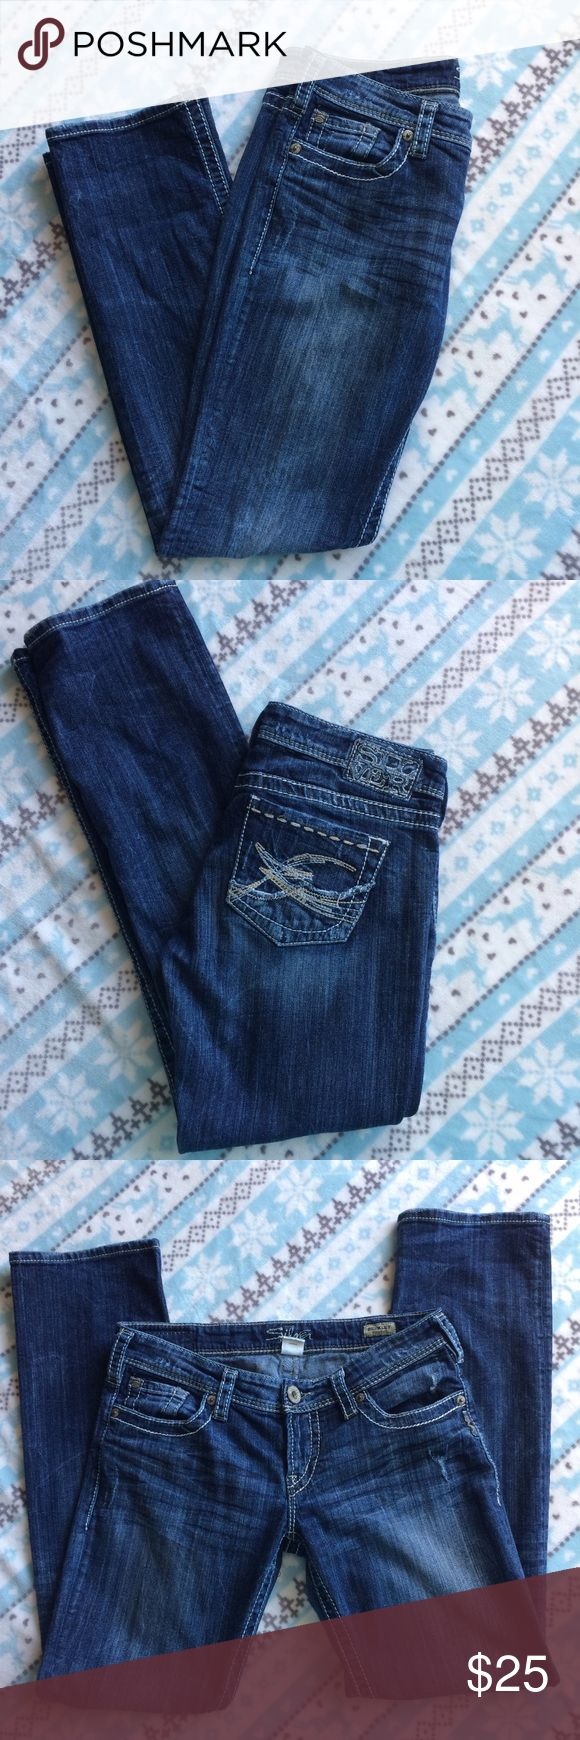 1000  ideas about Silver Jeans on Pinterest   Low cut jeans, miss ...